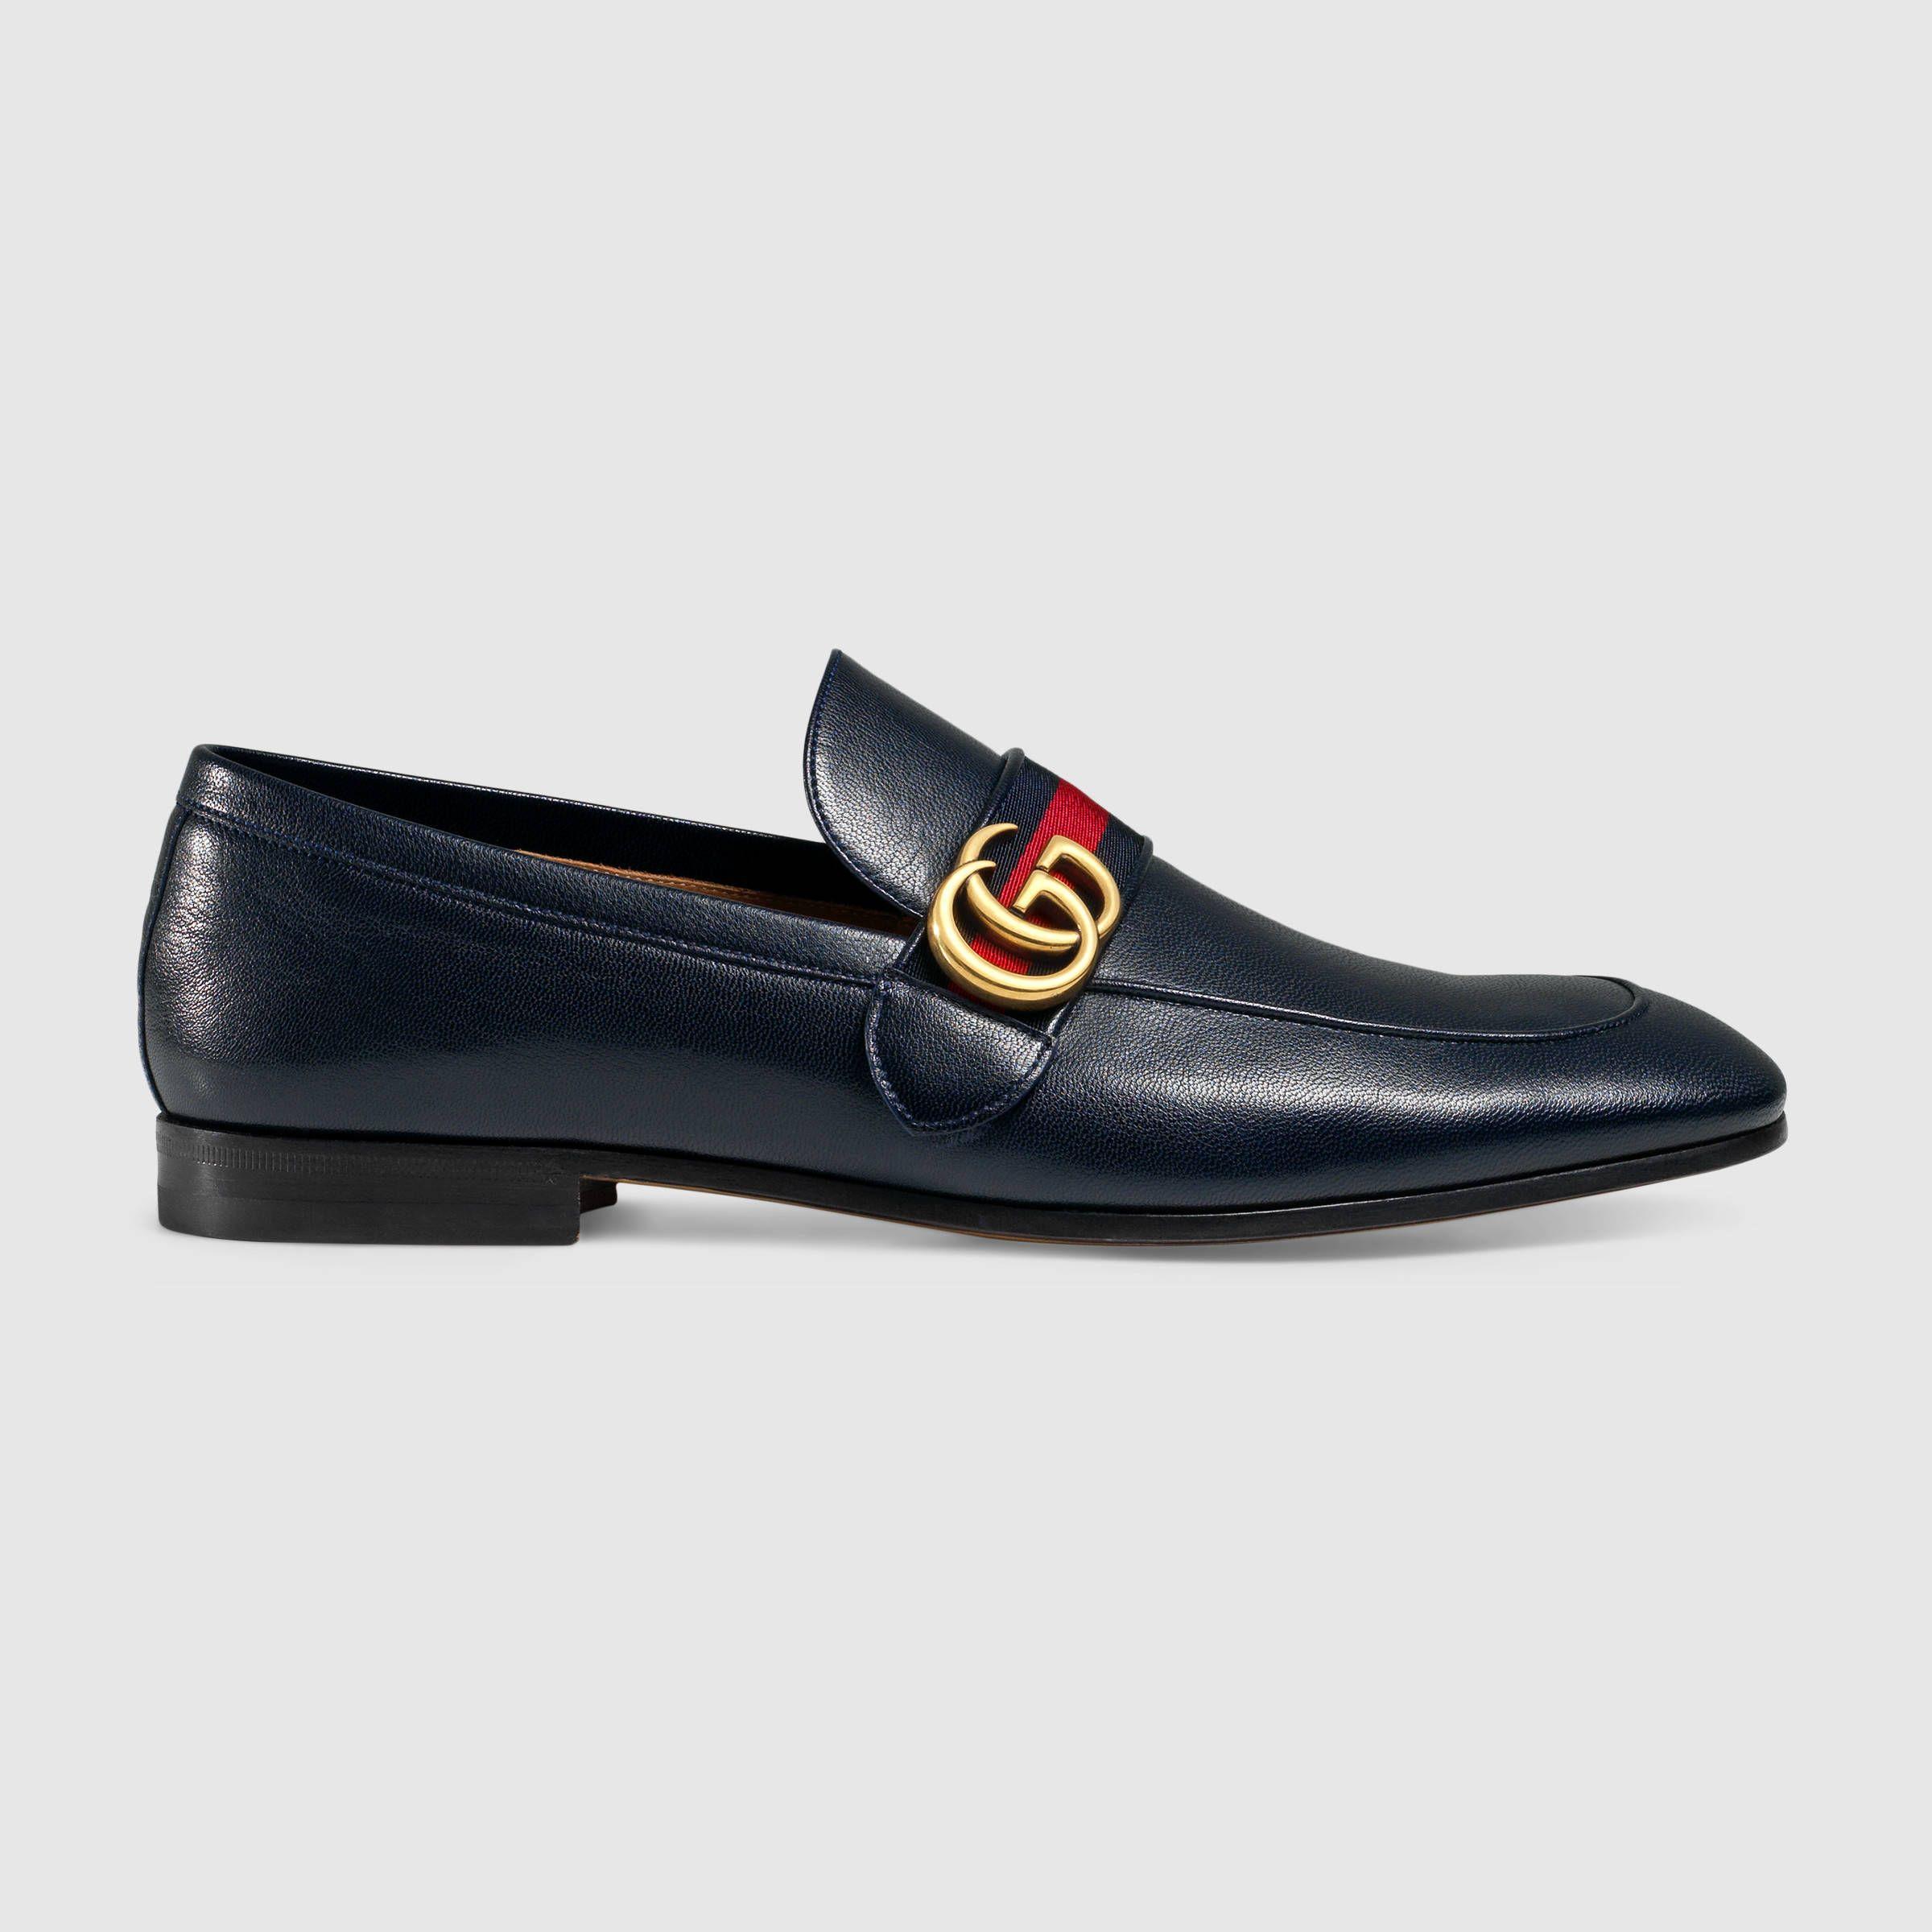 Pin De Michal Deneka En Wardrobe Outfits Zapatos Hombre Zapatos Elegantes Hombre Zapatos Formales Para Hombres